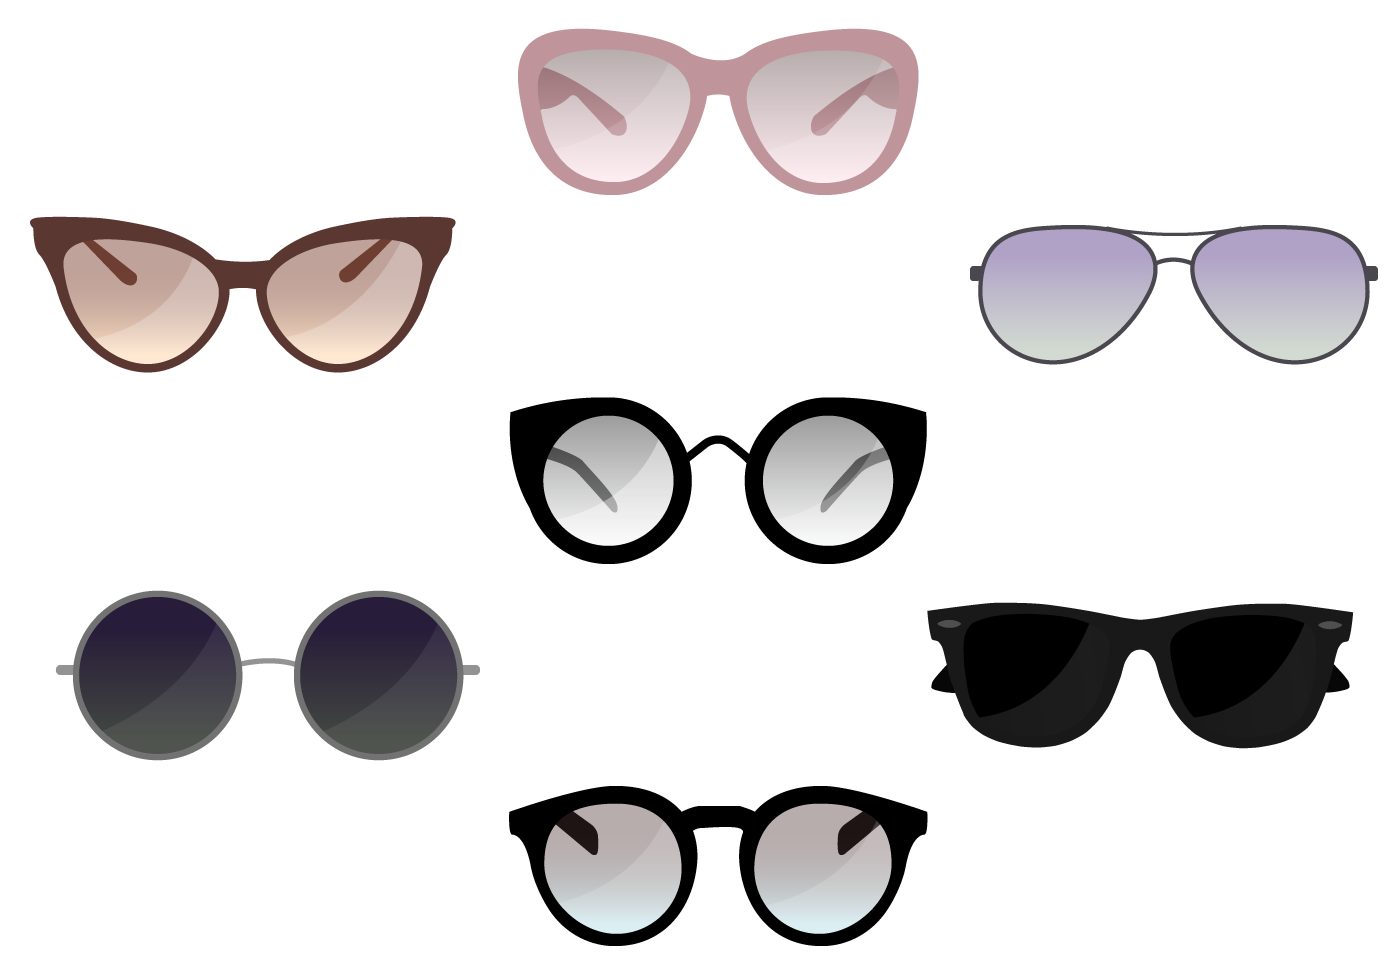 sunglasses vector download free vector art stock graphics images rh vecteezy com free vector cool sunglasses free vector aviator sunglasses